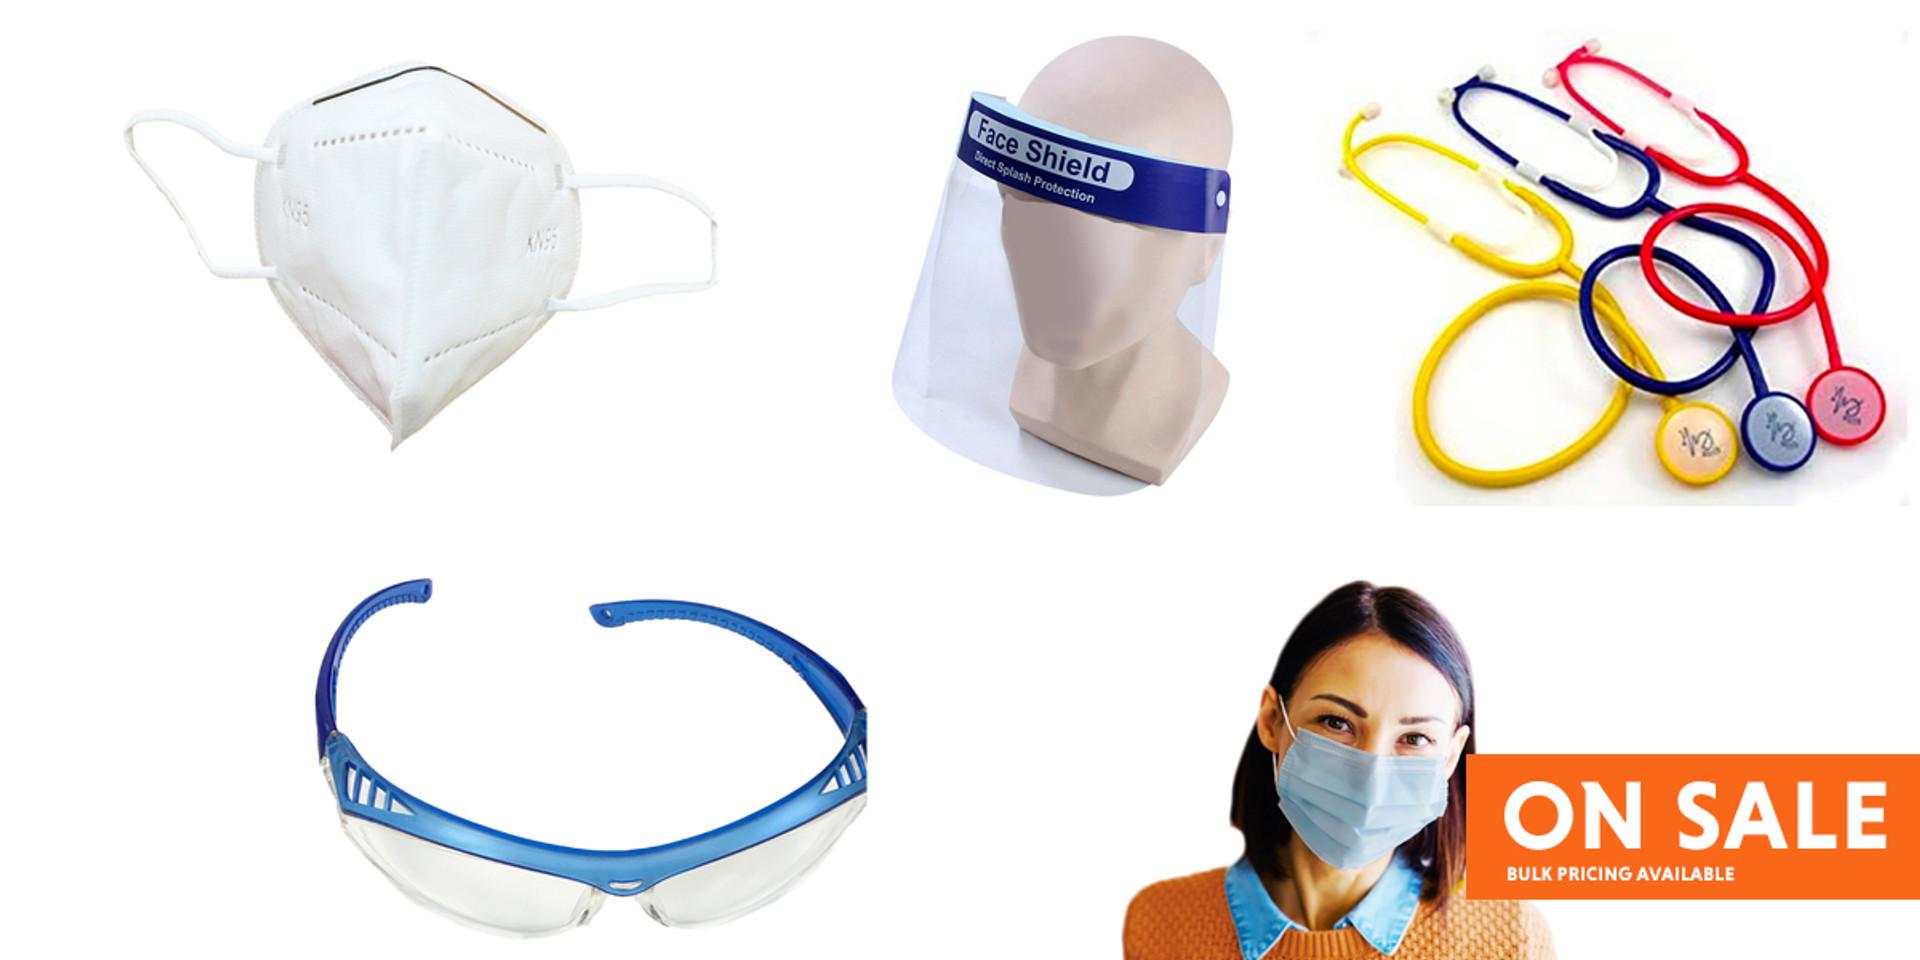 PPE On Sale